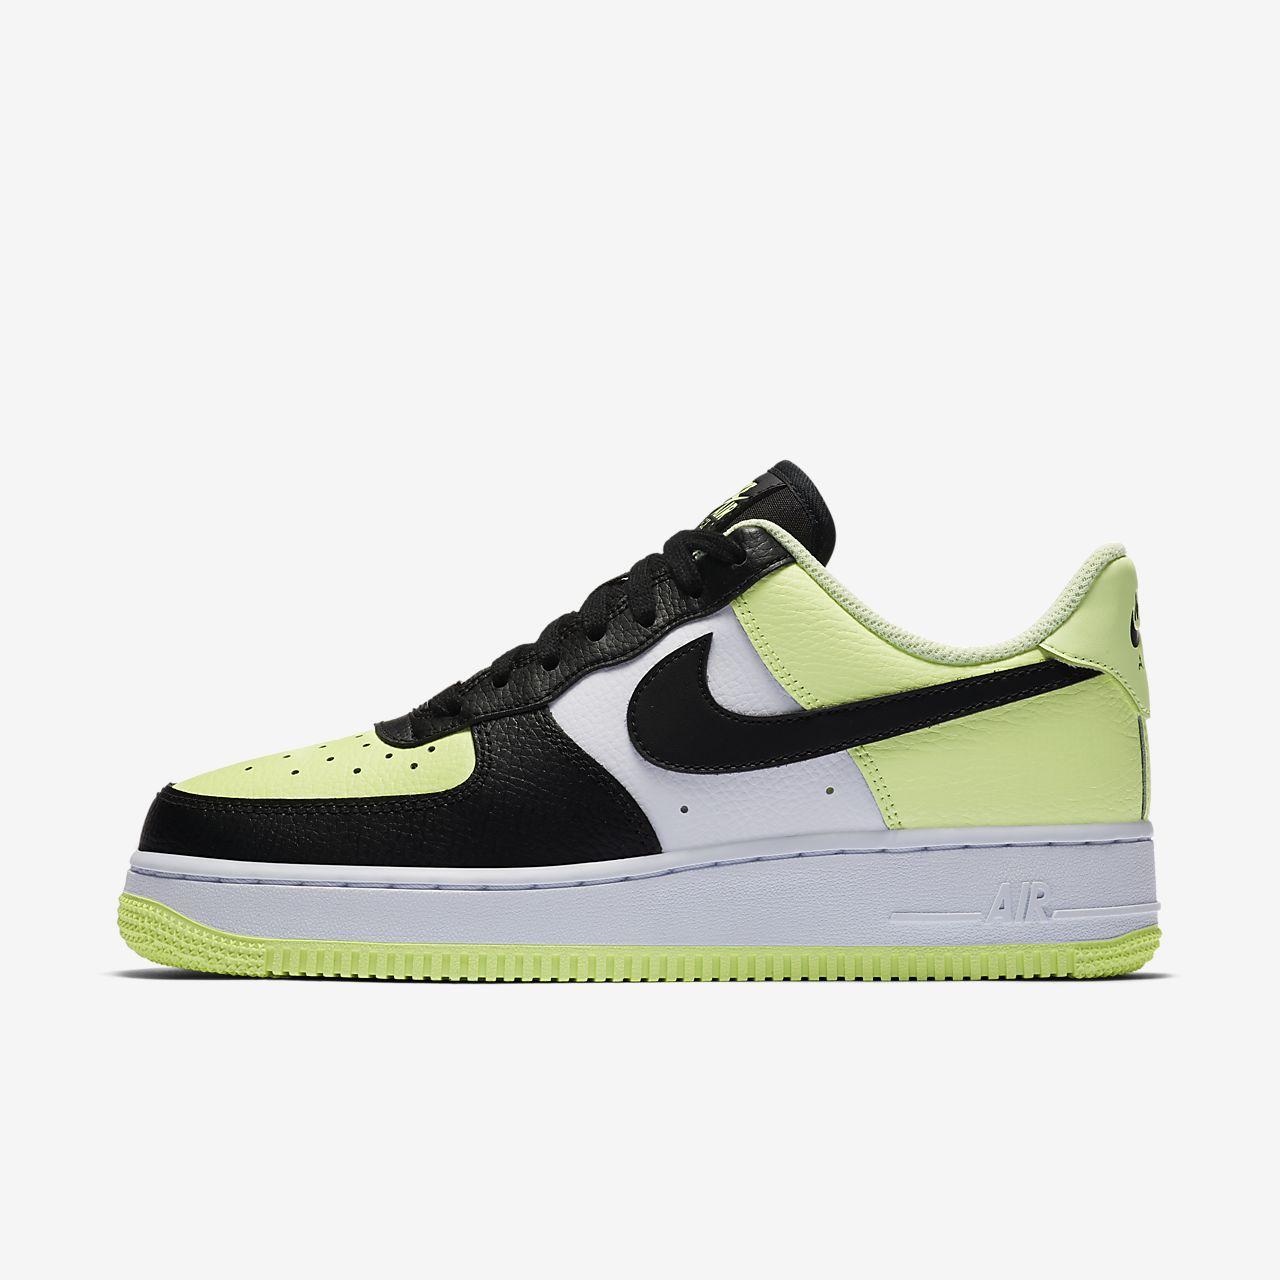 Nike Zoom Stefan Janoski Sneakers Barely VoltWhite